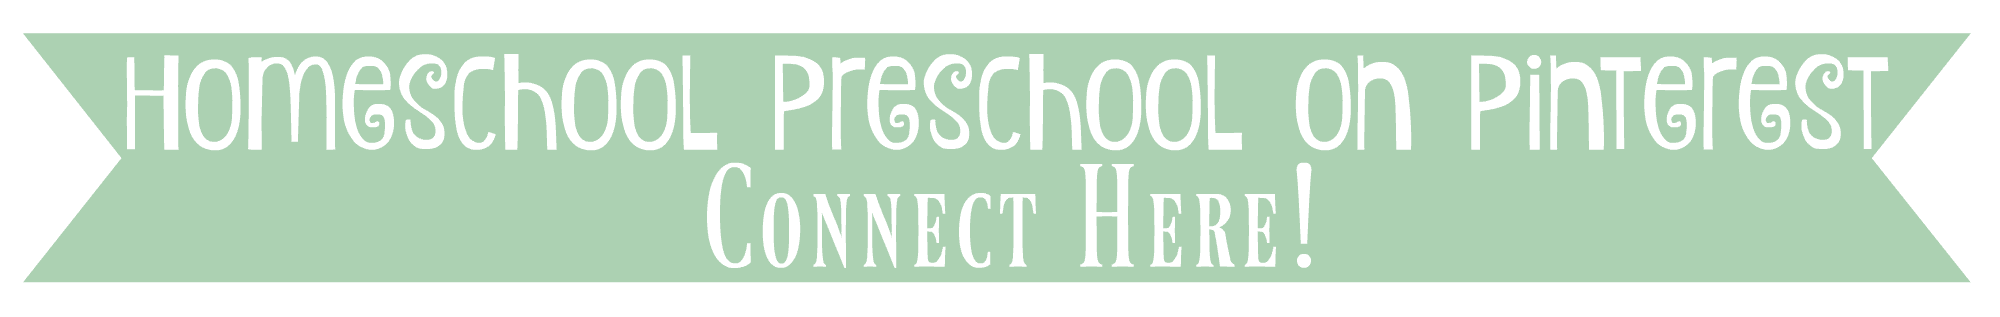 Homeschool Preschool on Pinterest Connect Here